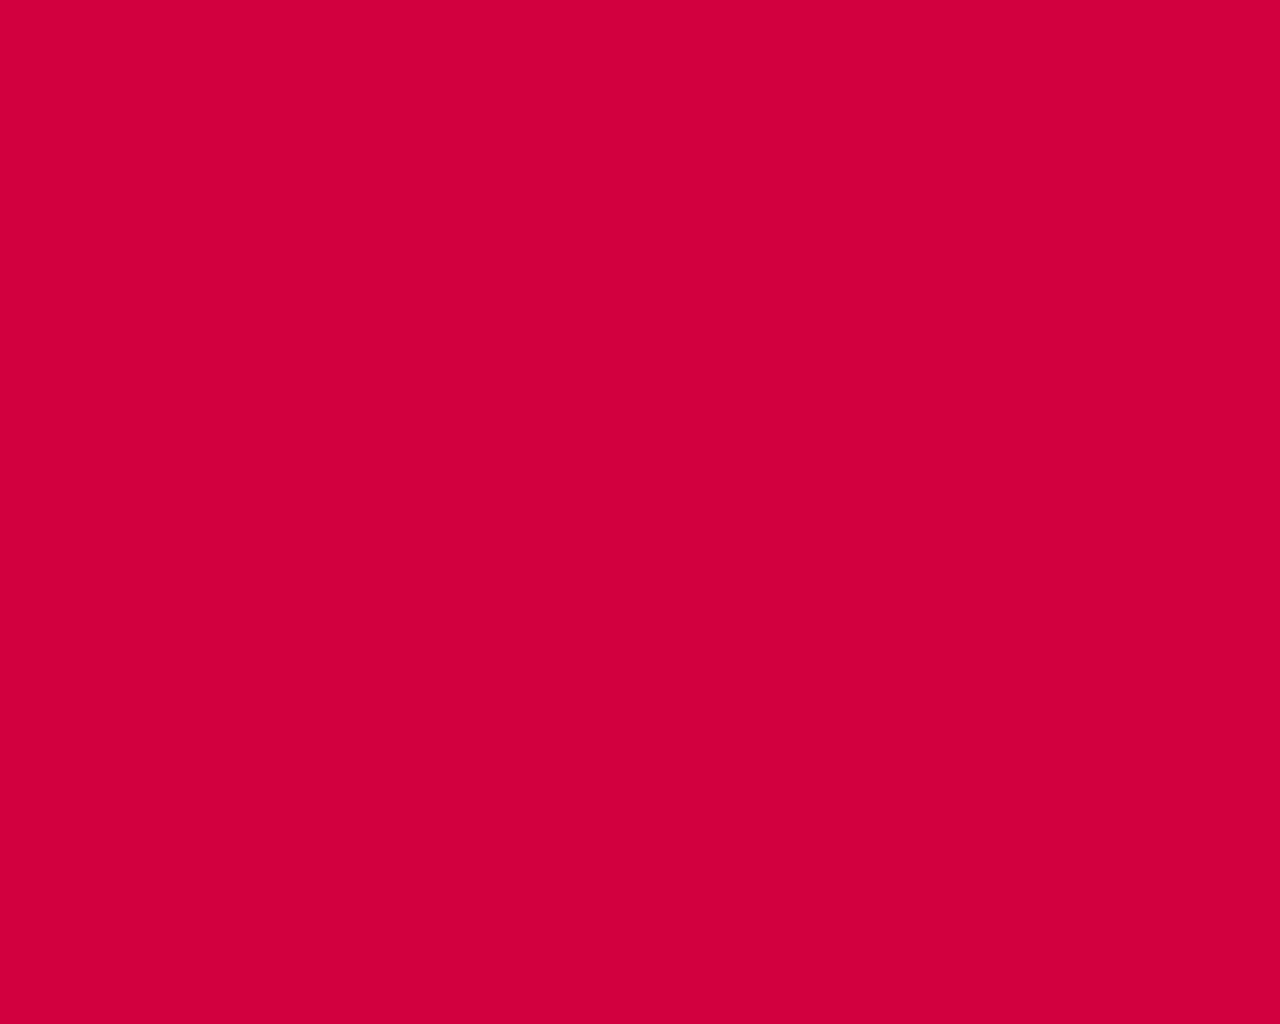 1280x1024 Utah Crimson Solid Color Background